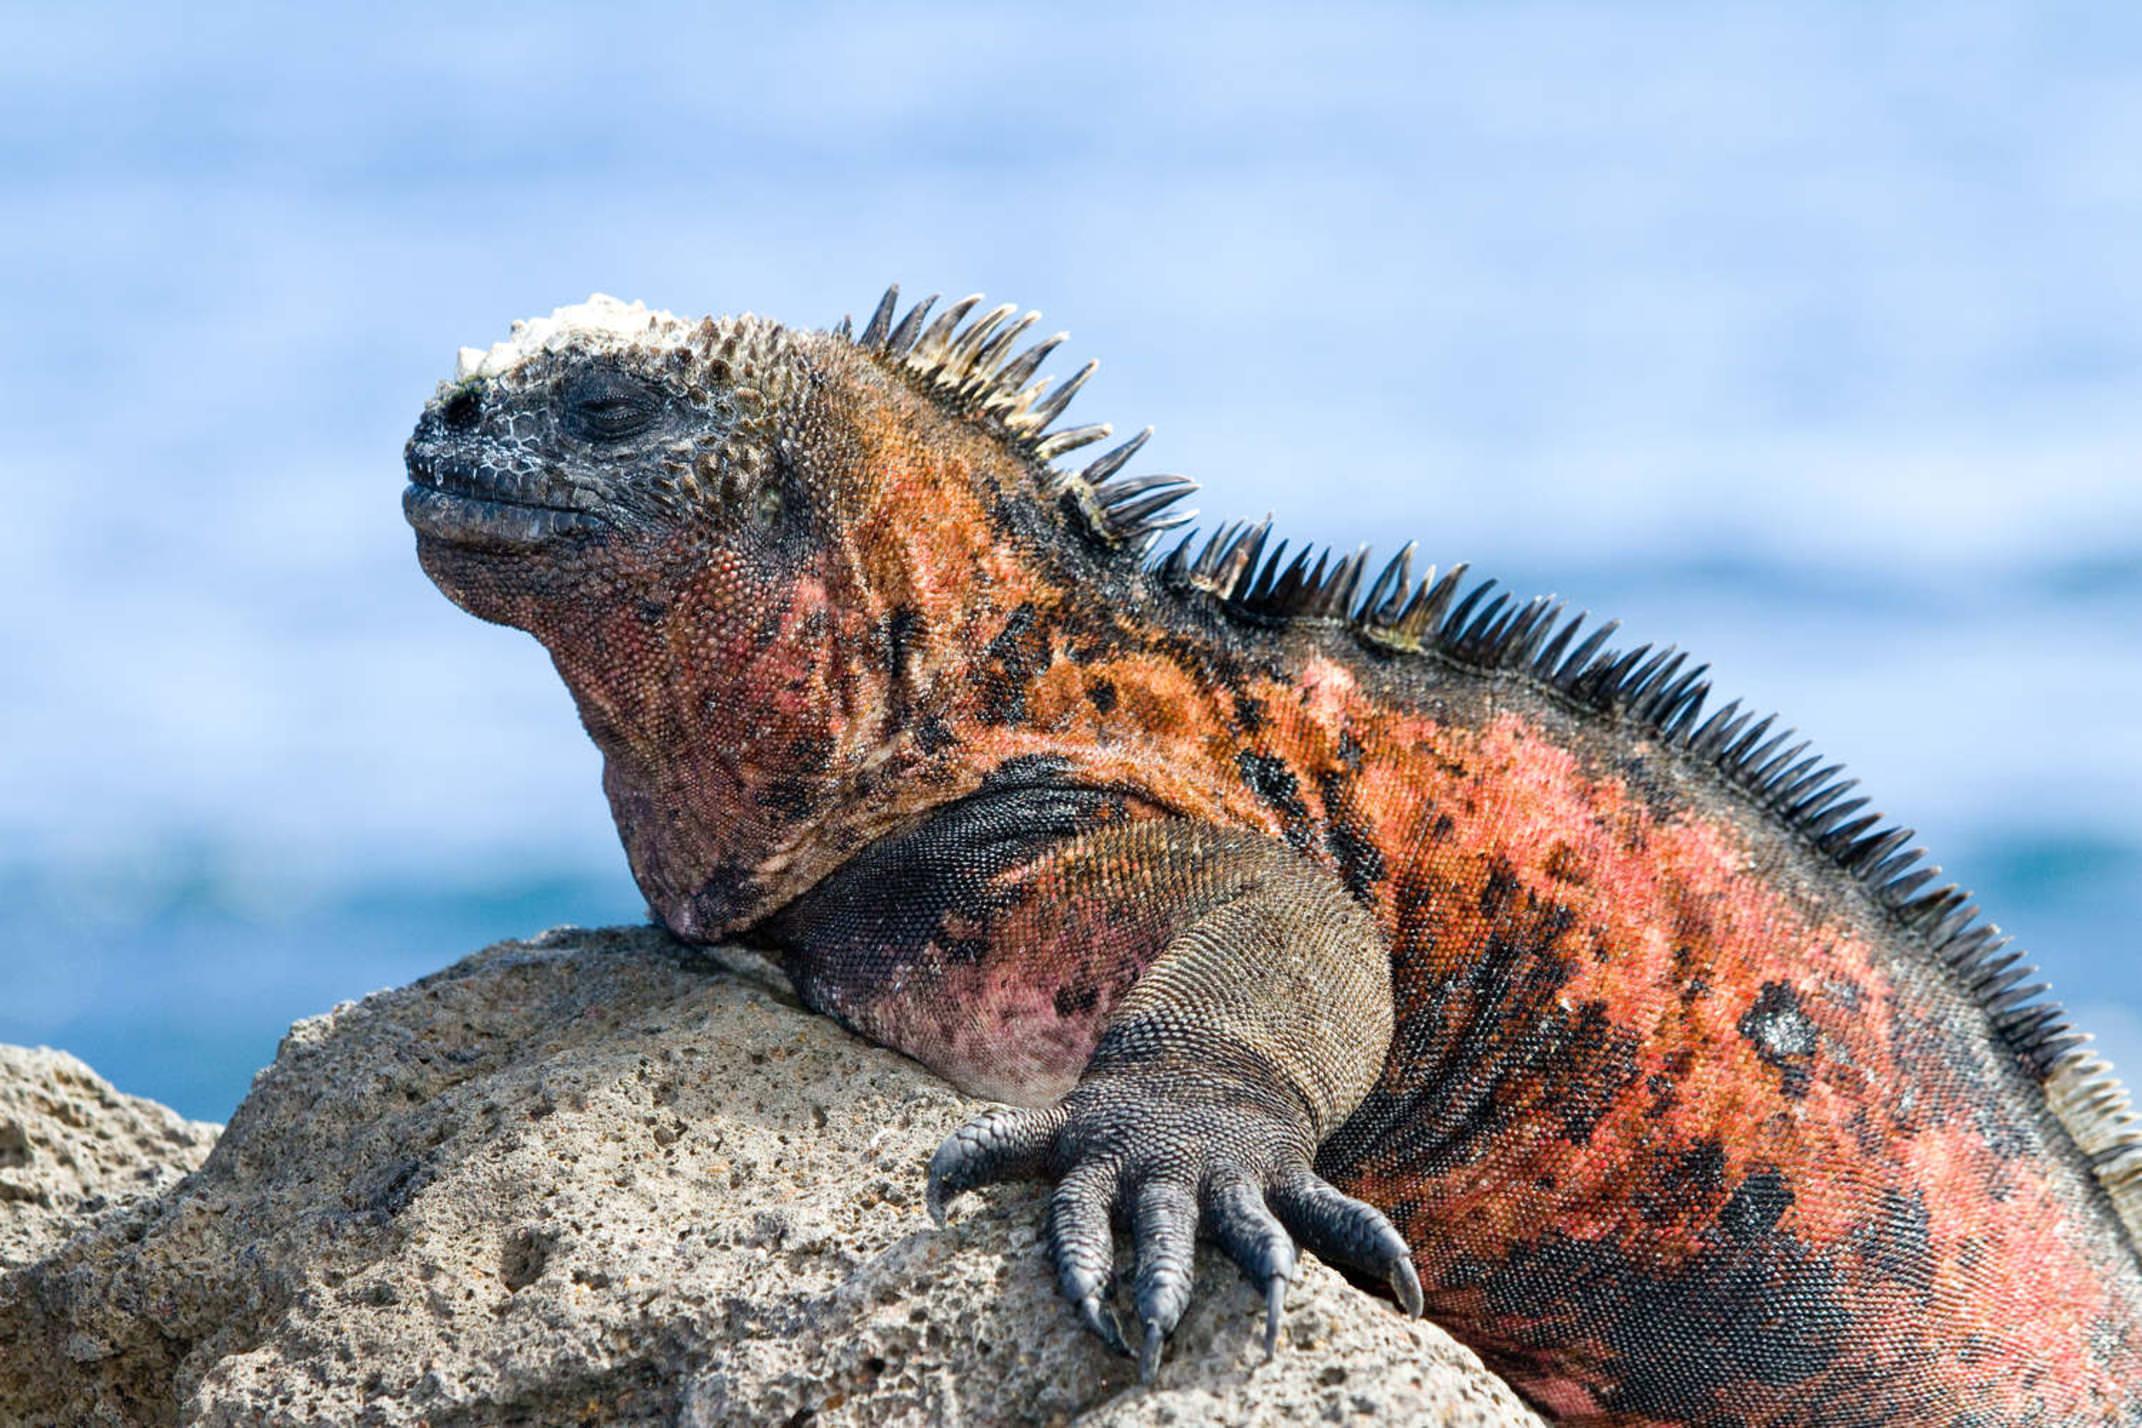 Ecuador galapagos islands galapagos marine iguana amblyrhynchus cristatus